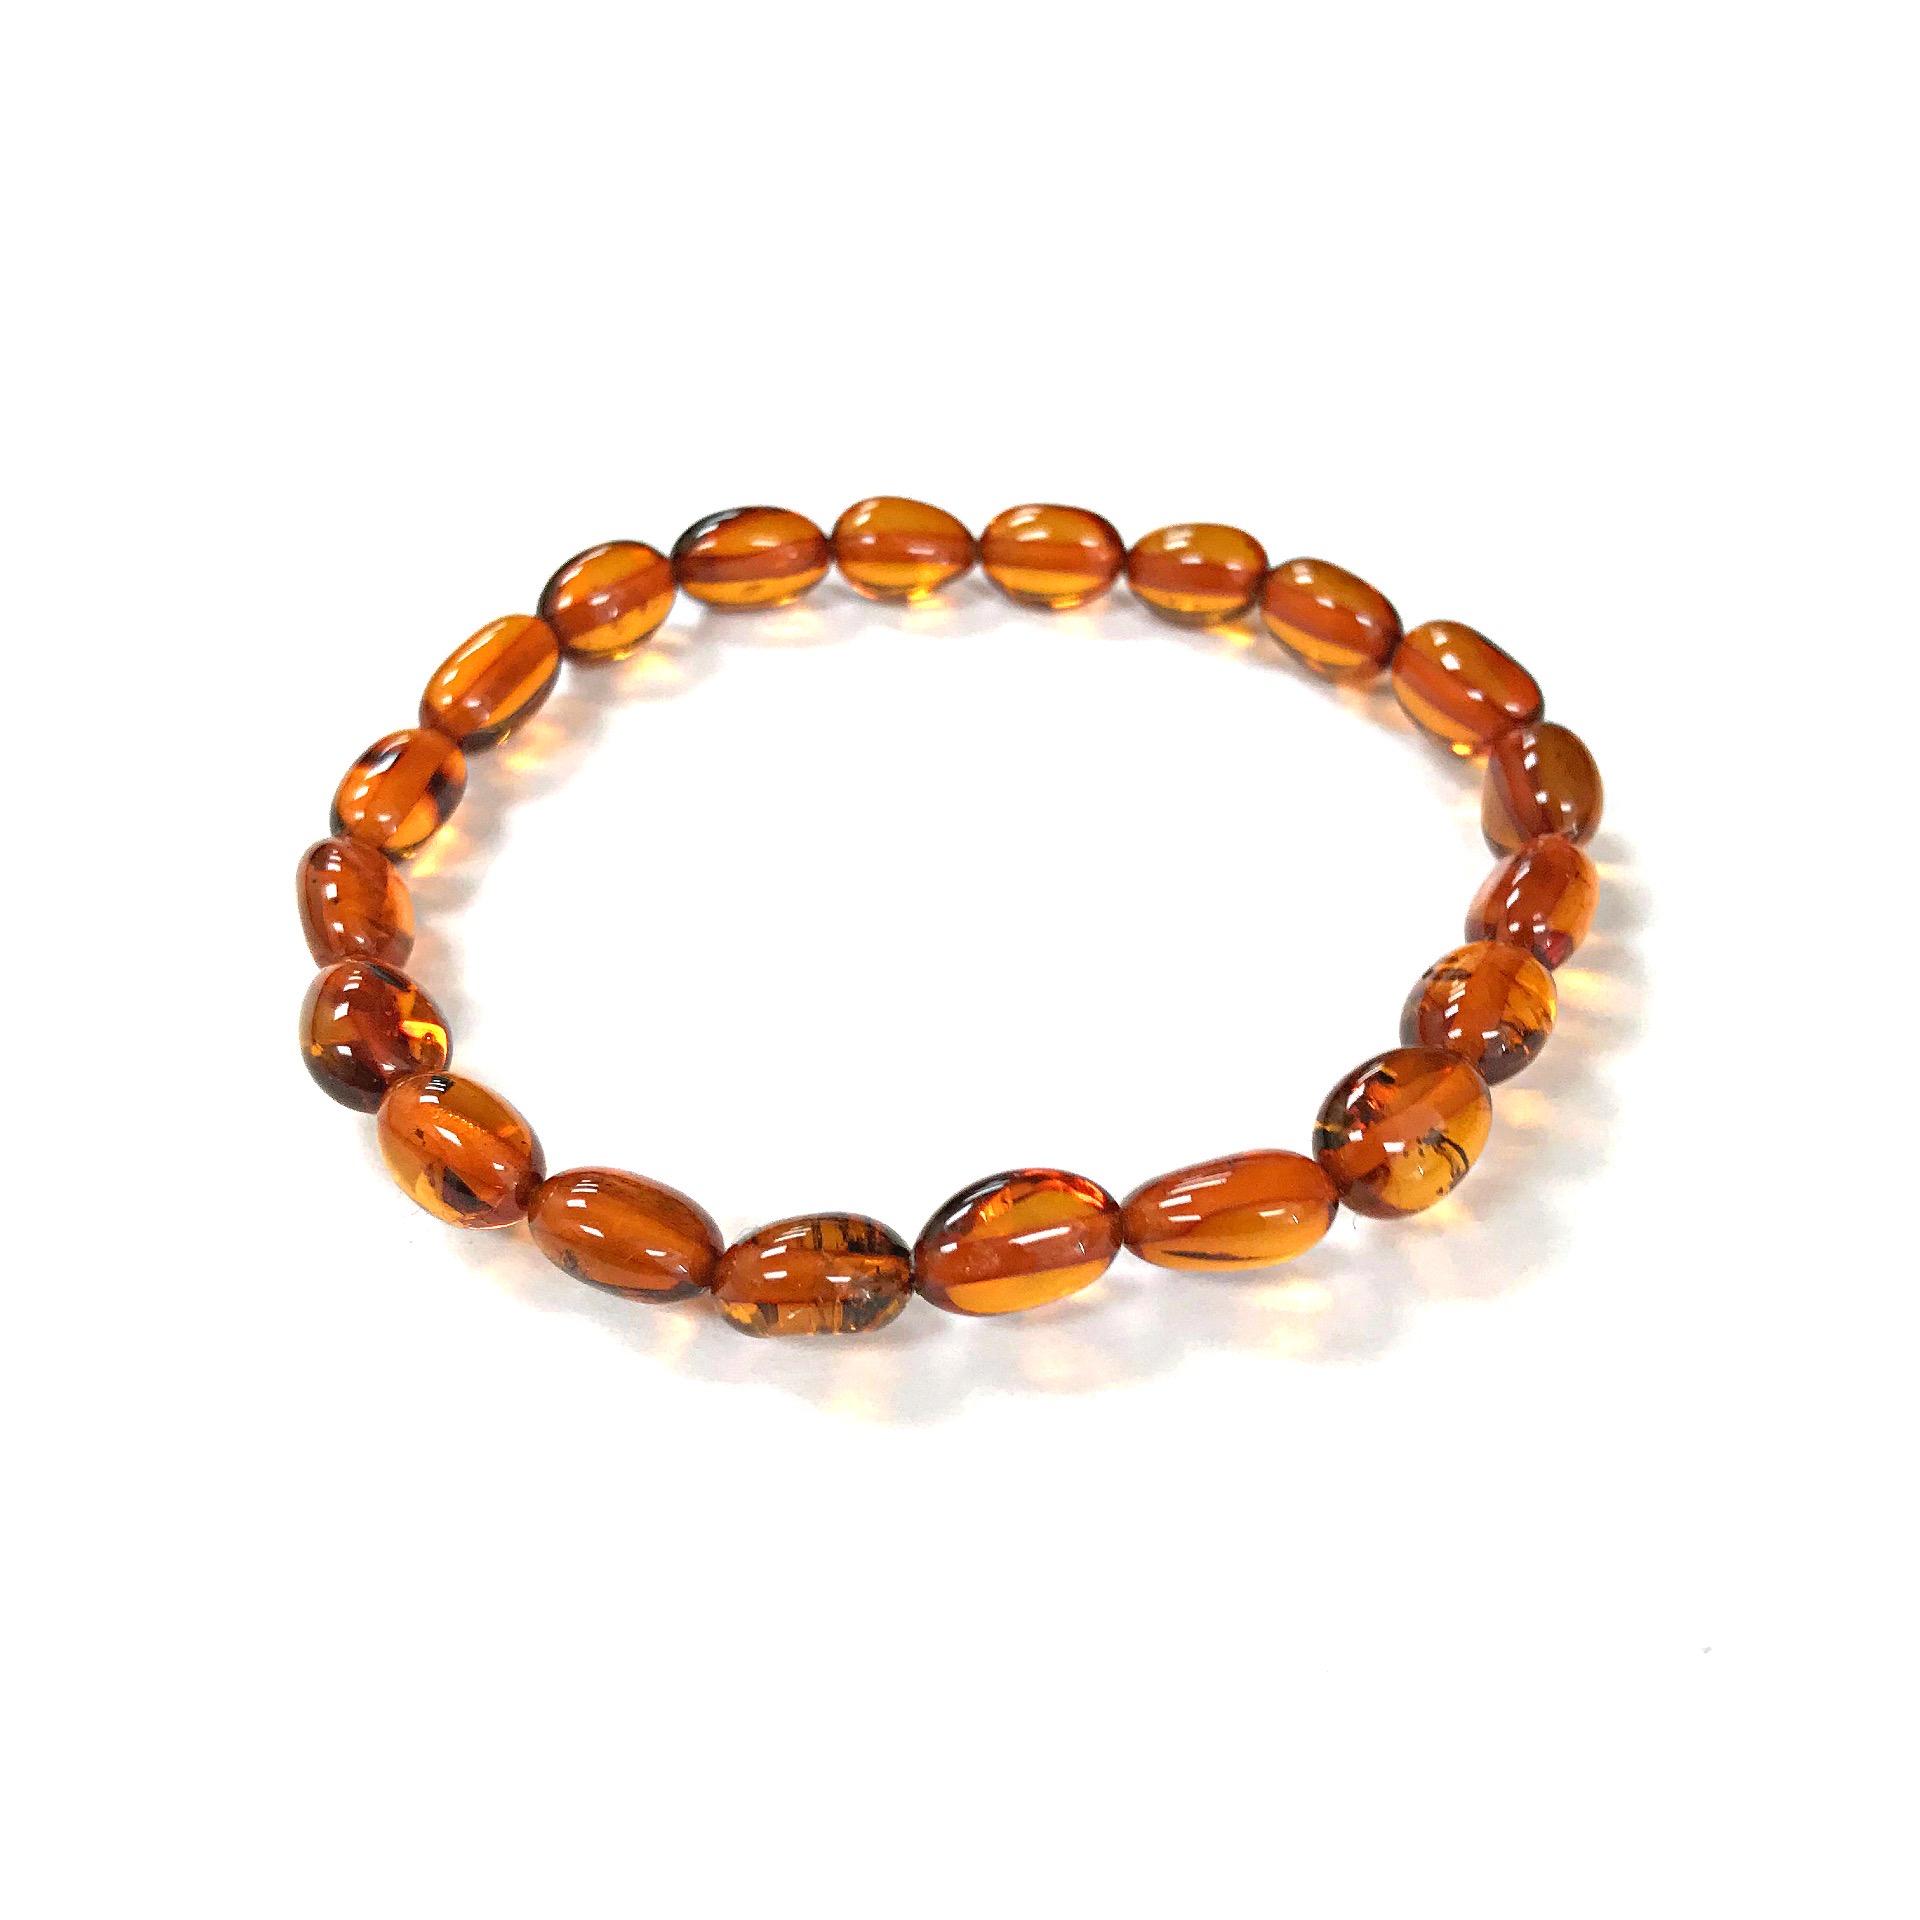 Natural Baltic amber stretch bracelet. Amberman. www.amberman.com